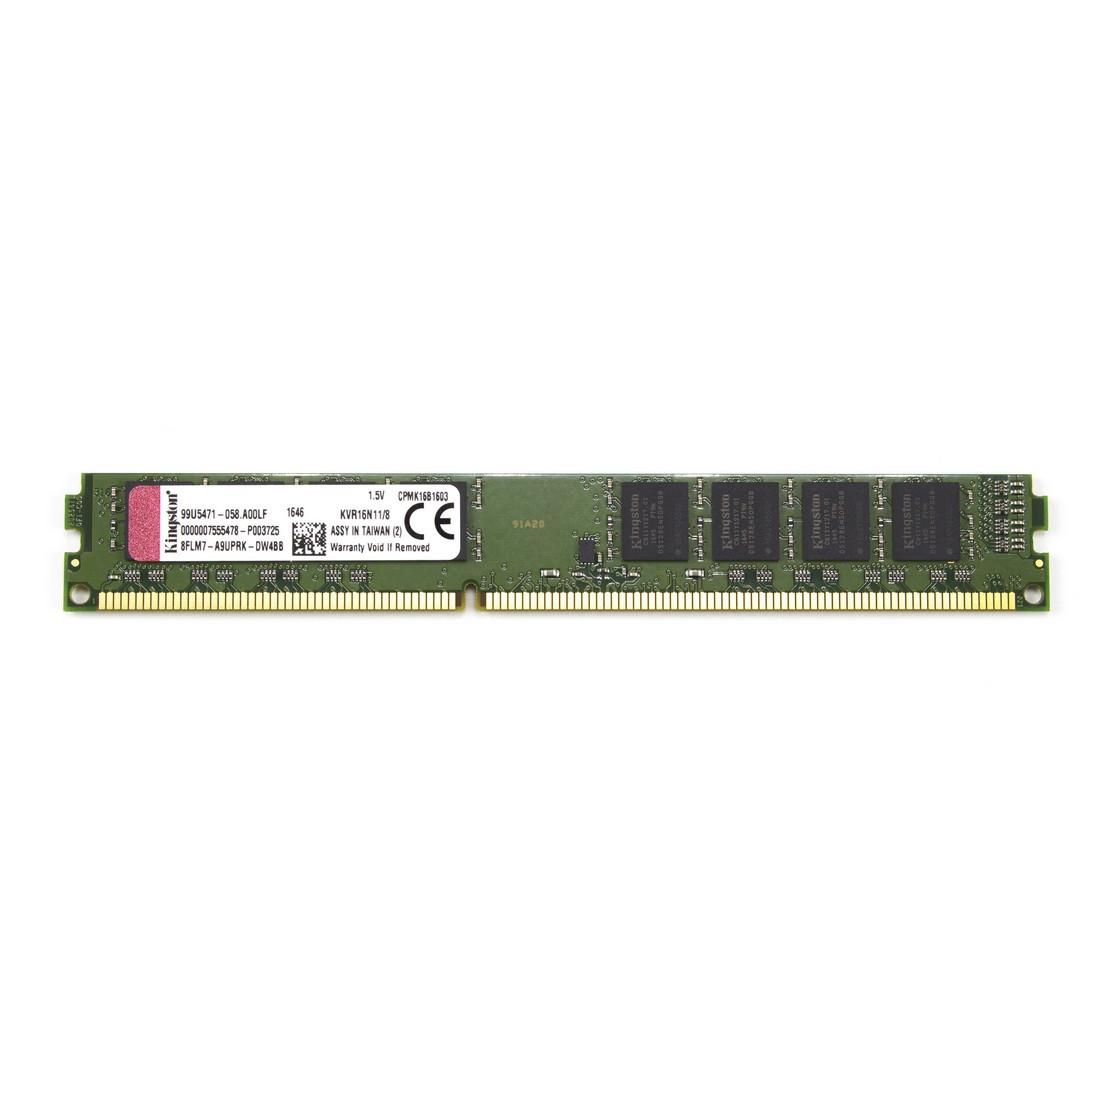 ОЗУ Kingston 8Gb/1600MHz U11 DDR3 UDIMM KVR16N11/8